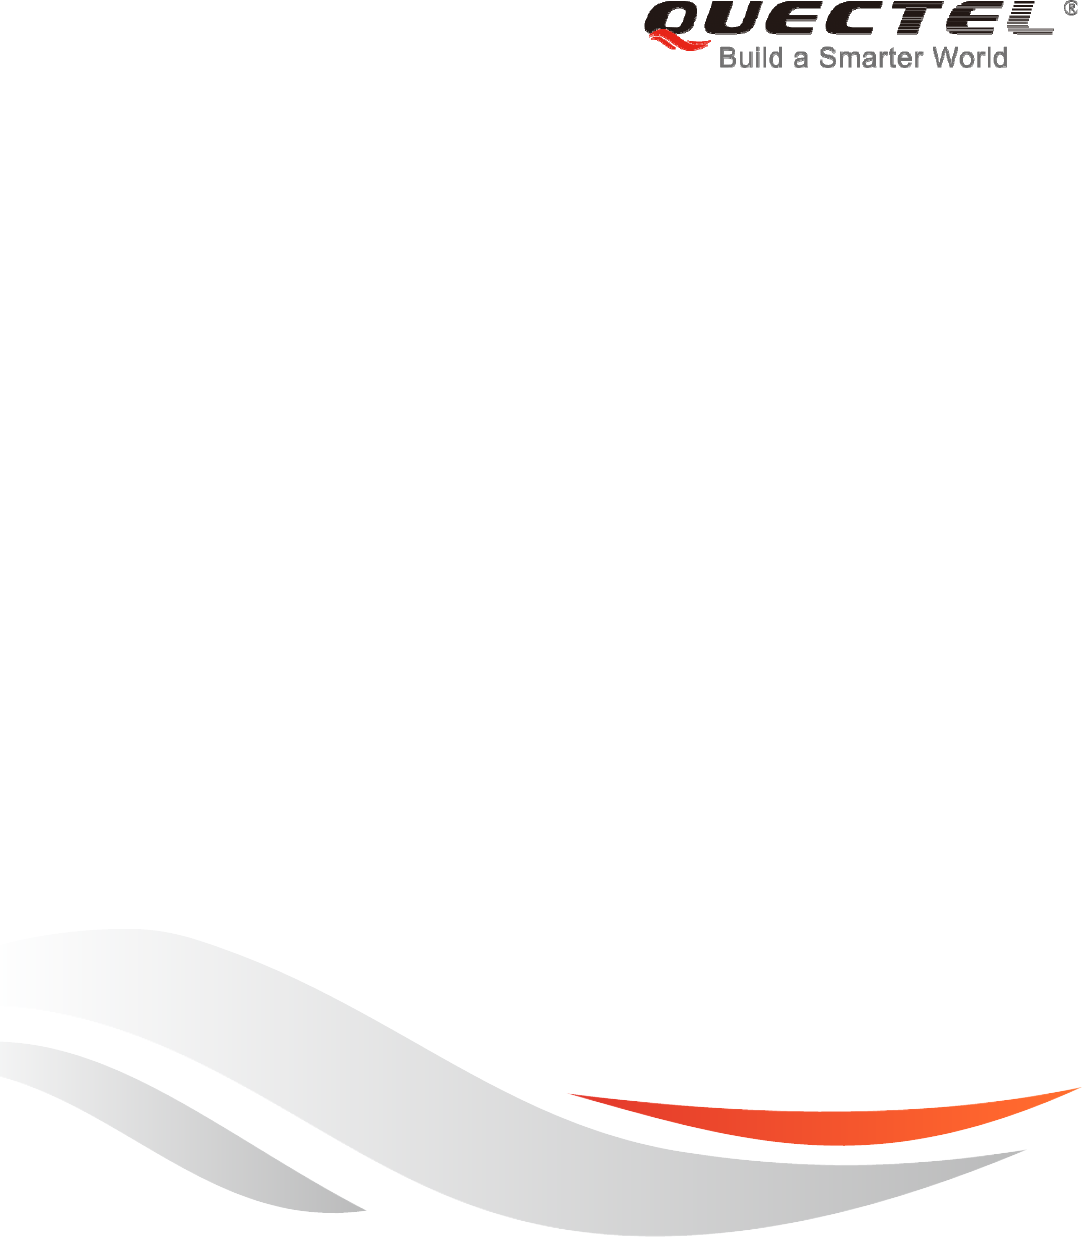 Quectel Wireless Solutions 201609MC20 GSM/GPRS/GNSS Module User Manual